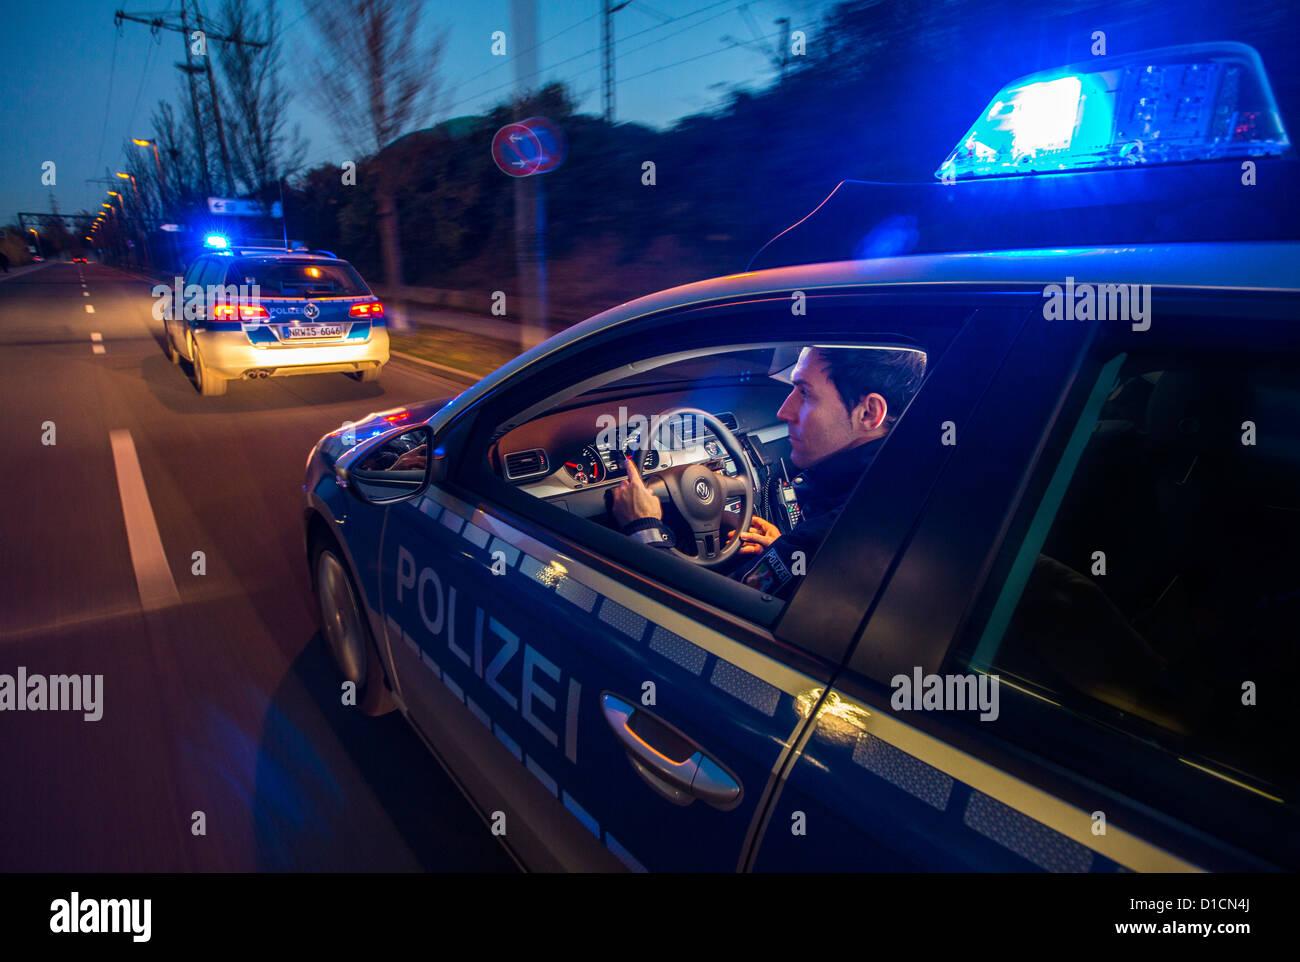 Police patrol car with blue flashing lights, signal horn